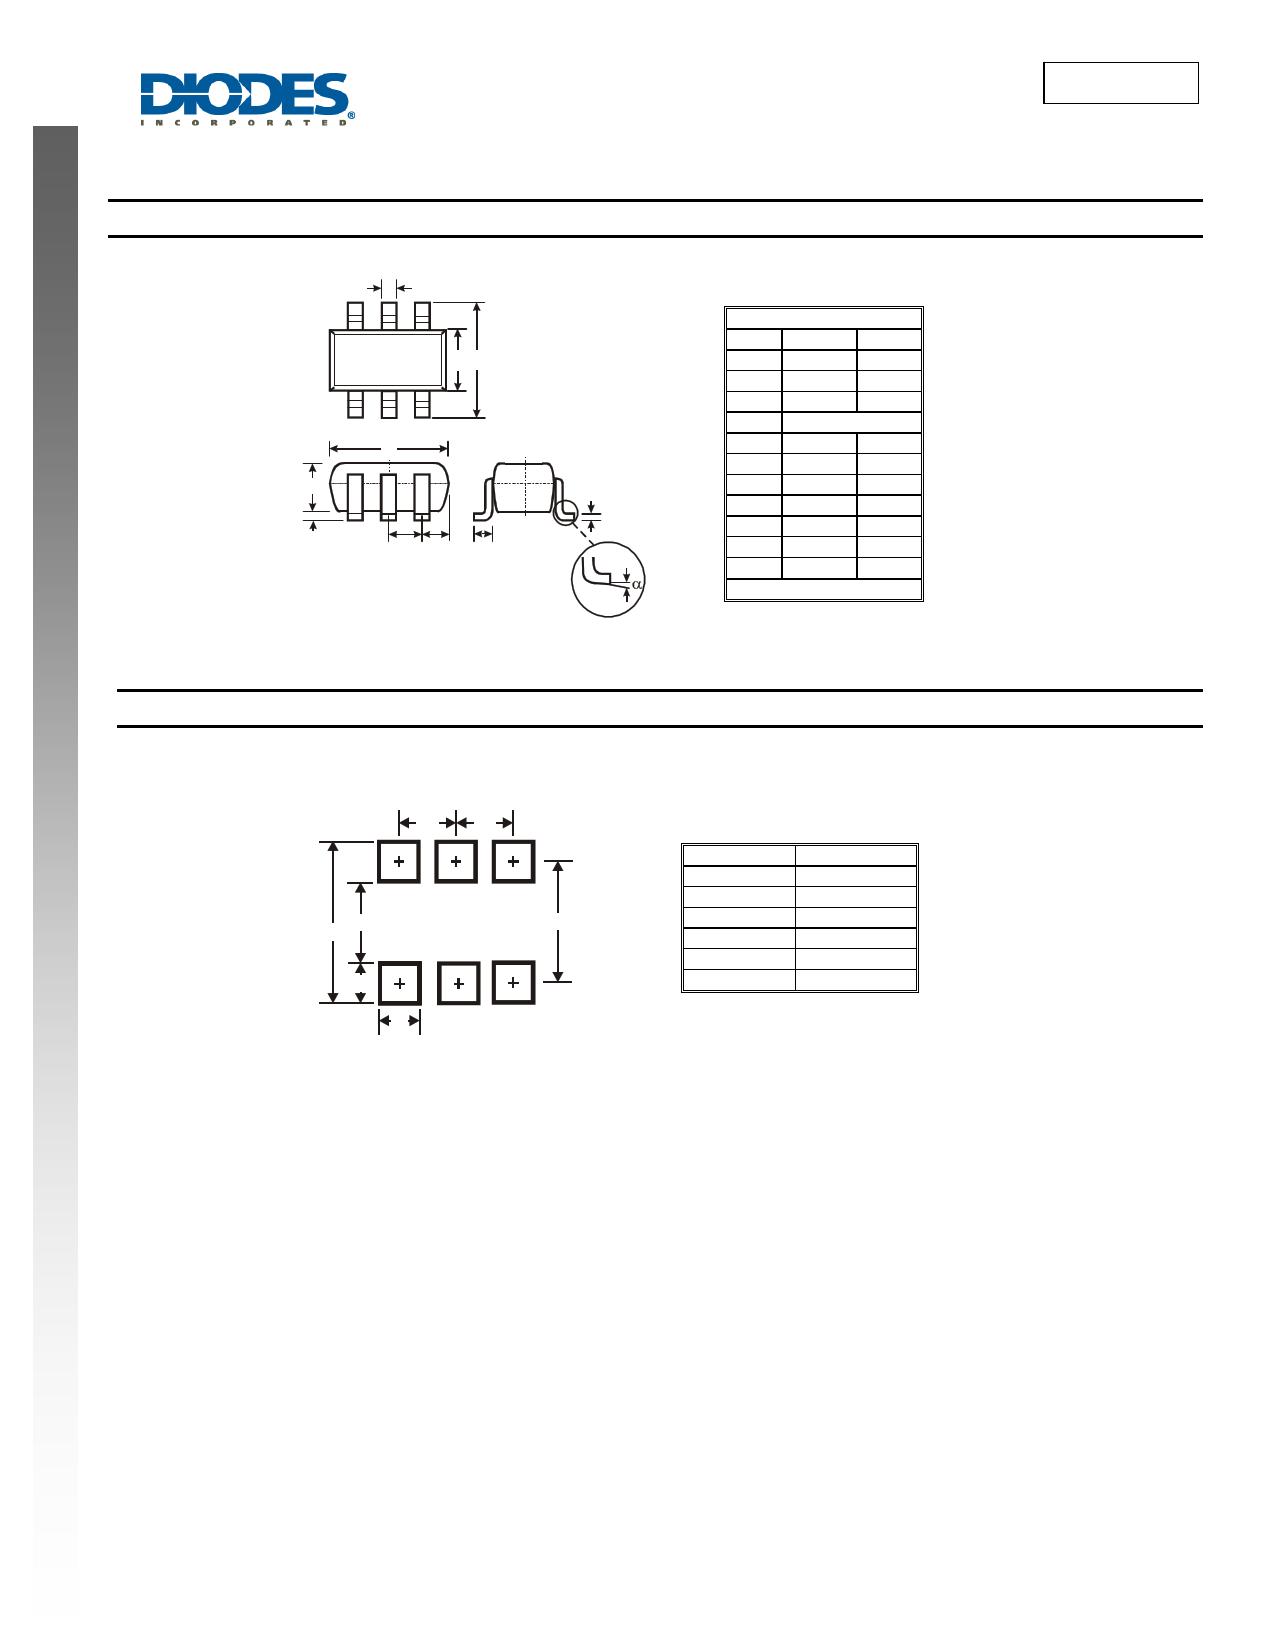 2x062h datasheet